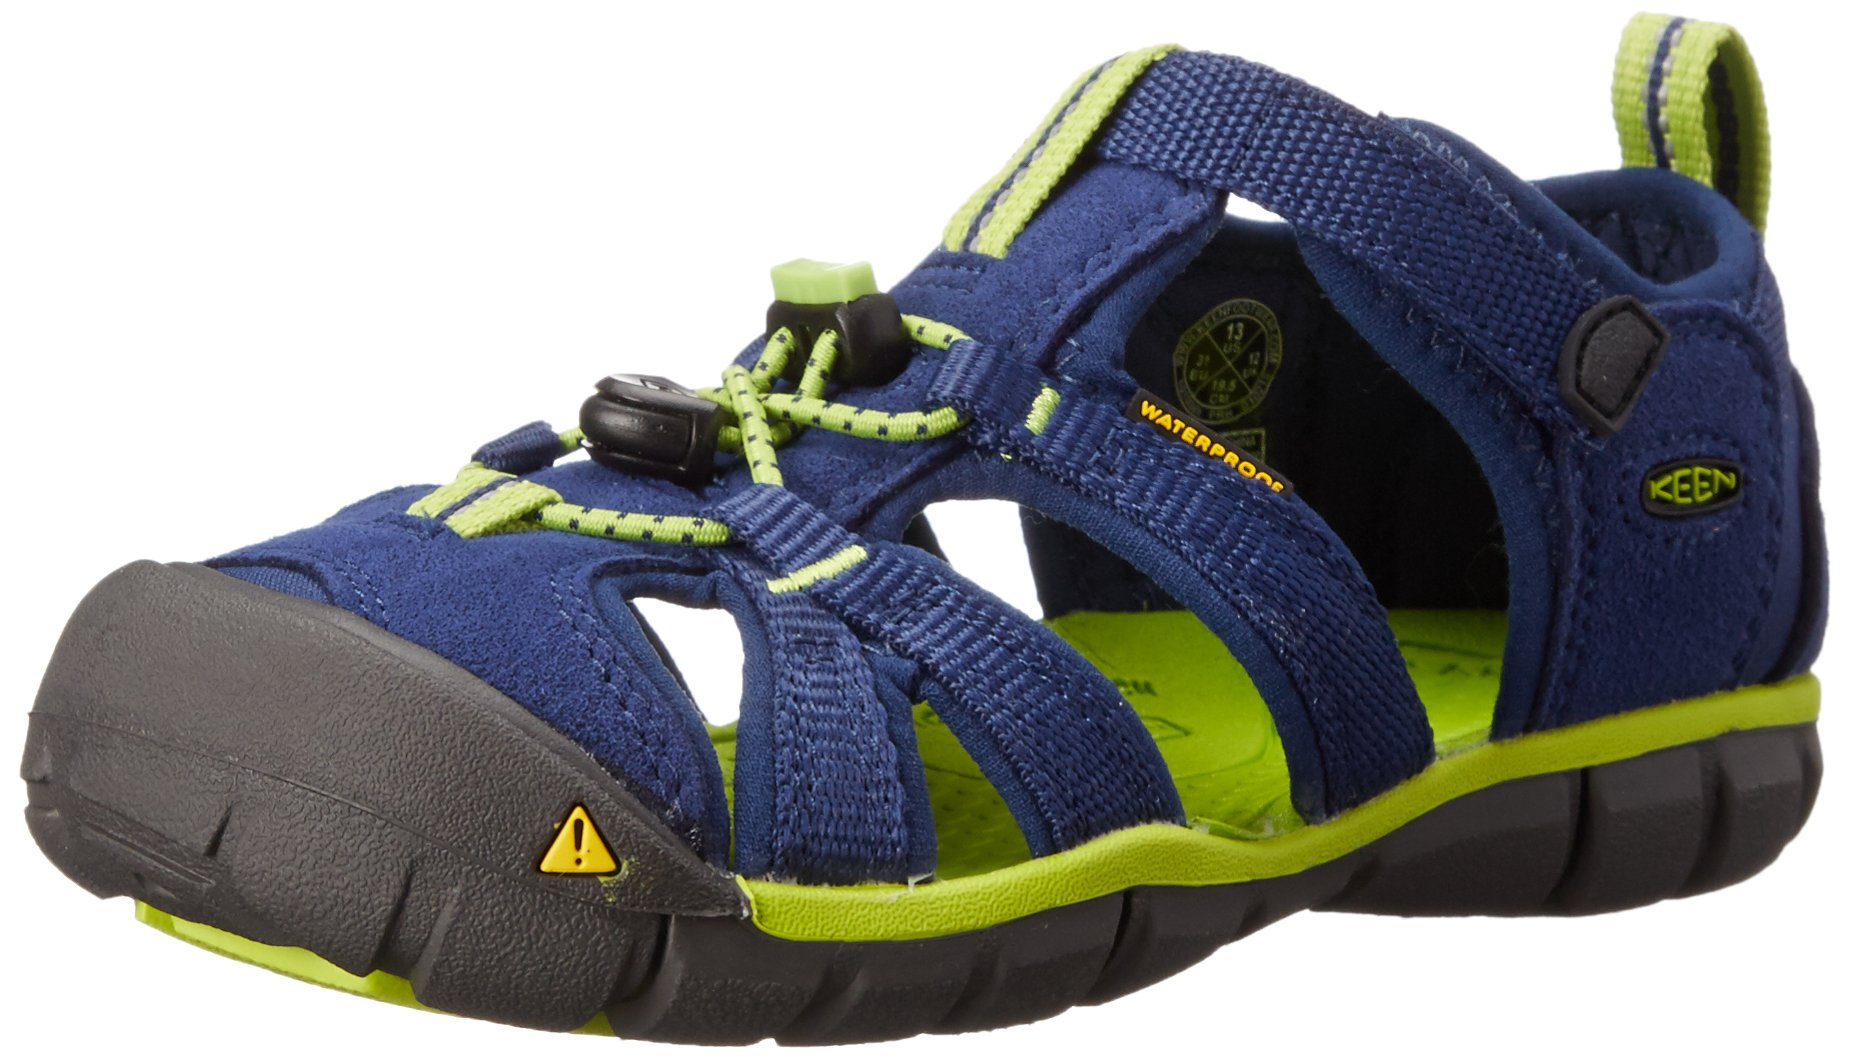 KEEN Seacamp II CNX Sandal (Toddler),Blue Depths/Lime Green,4 M US Toddler